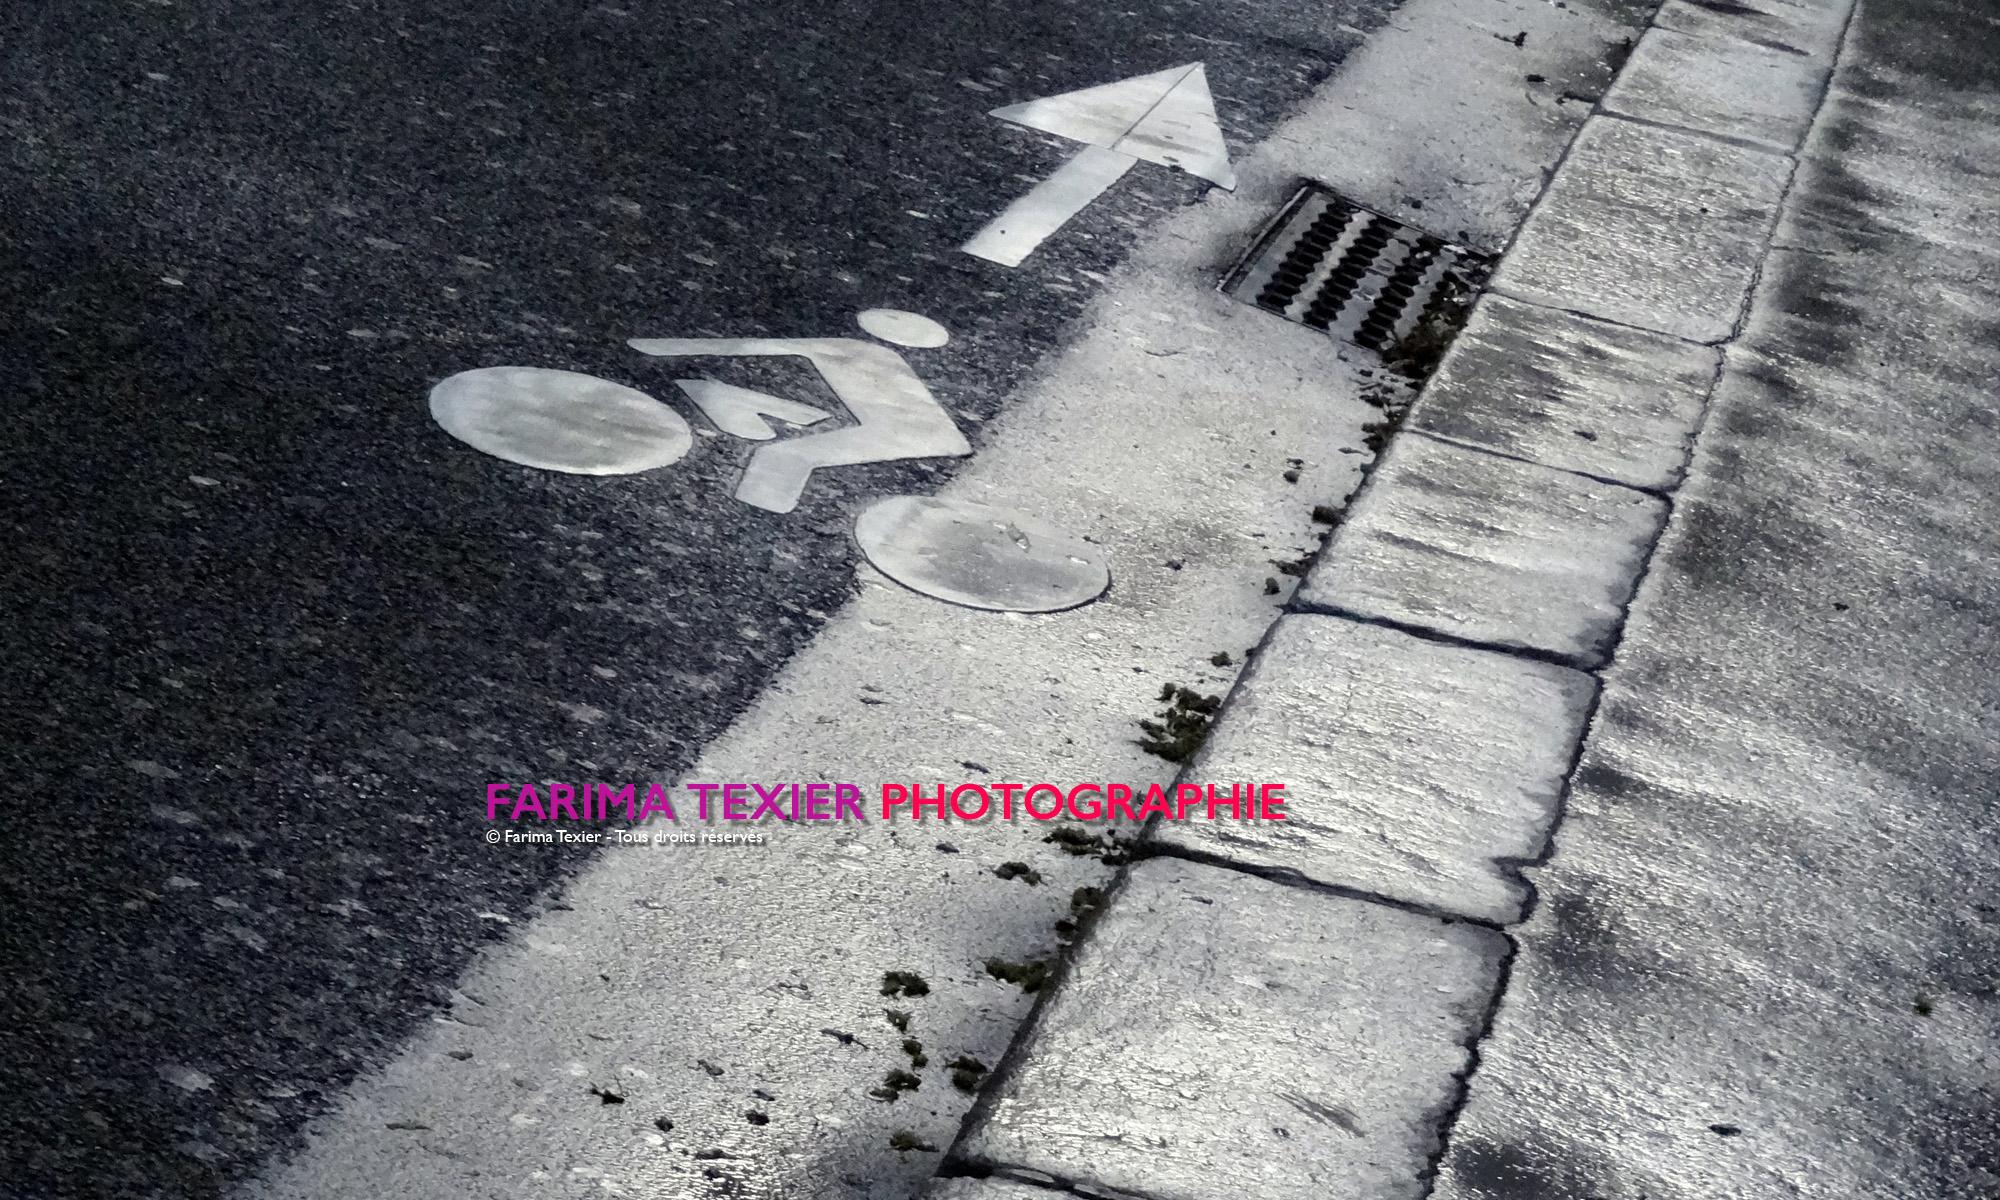 Farima Texier Photographie